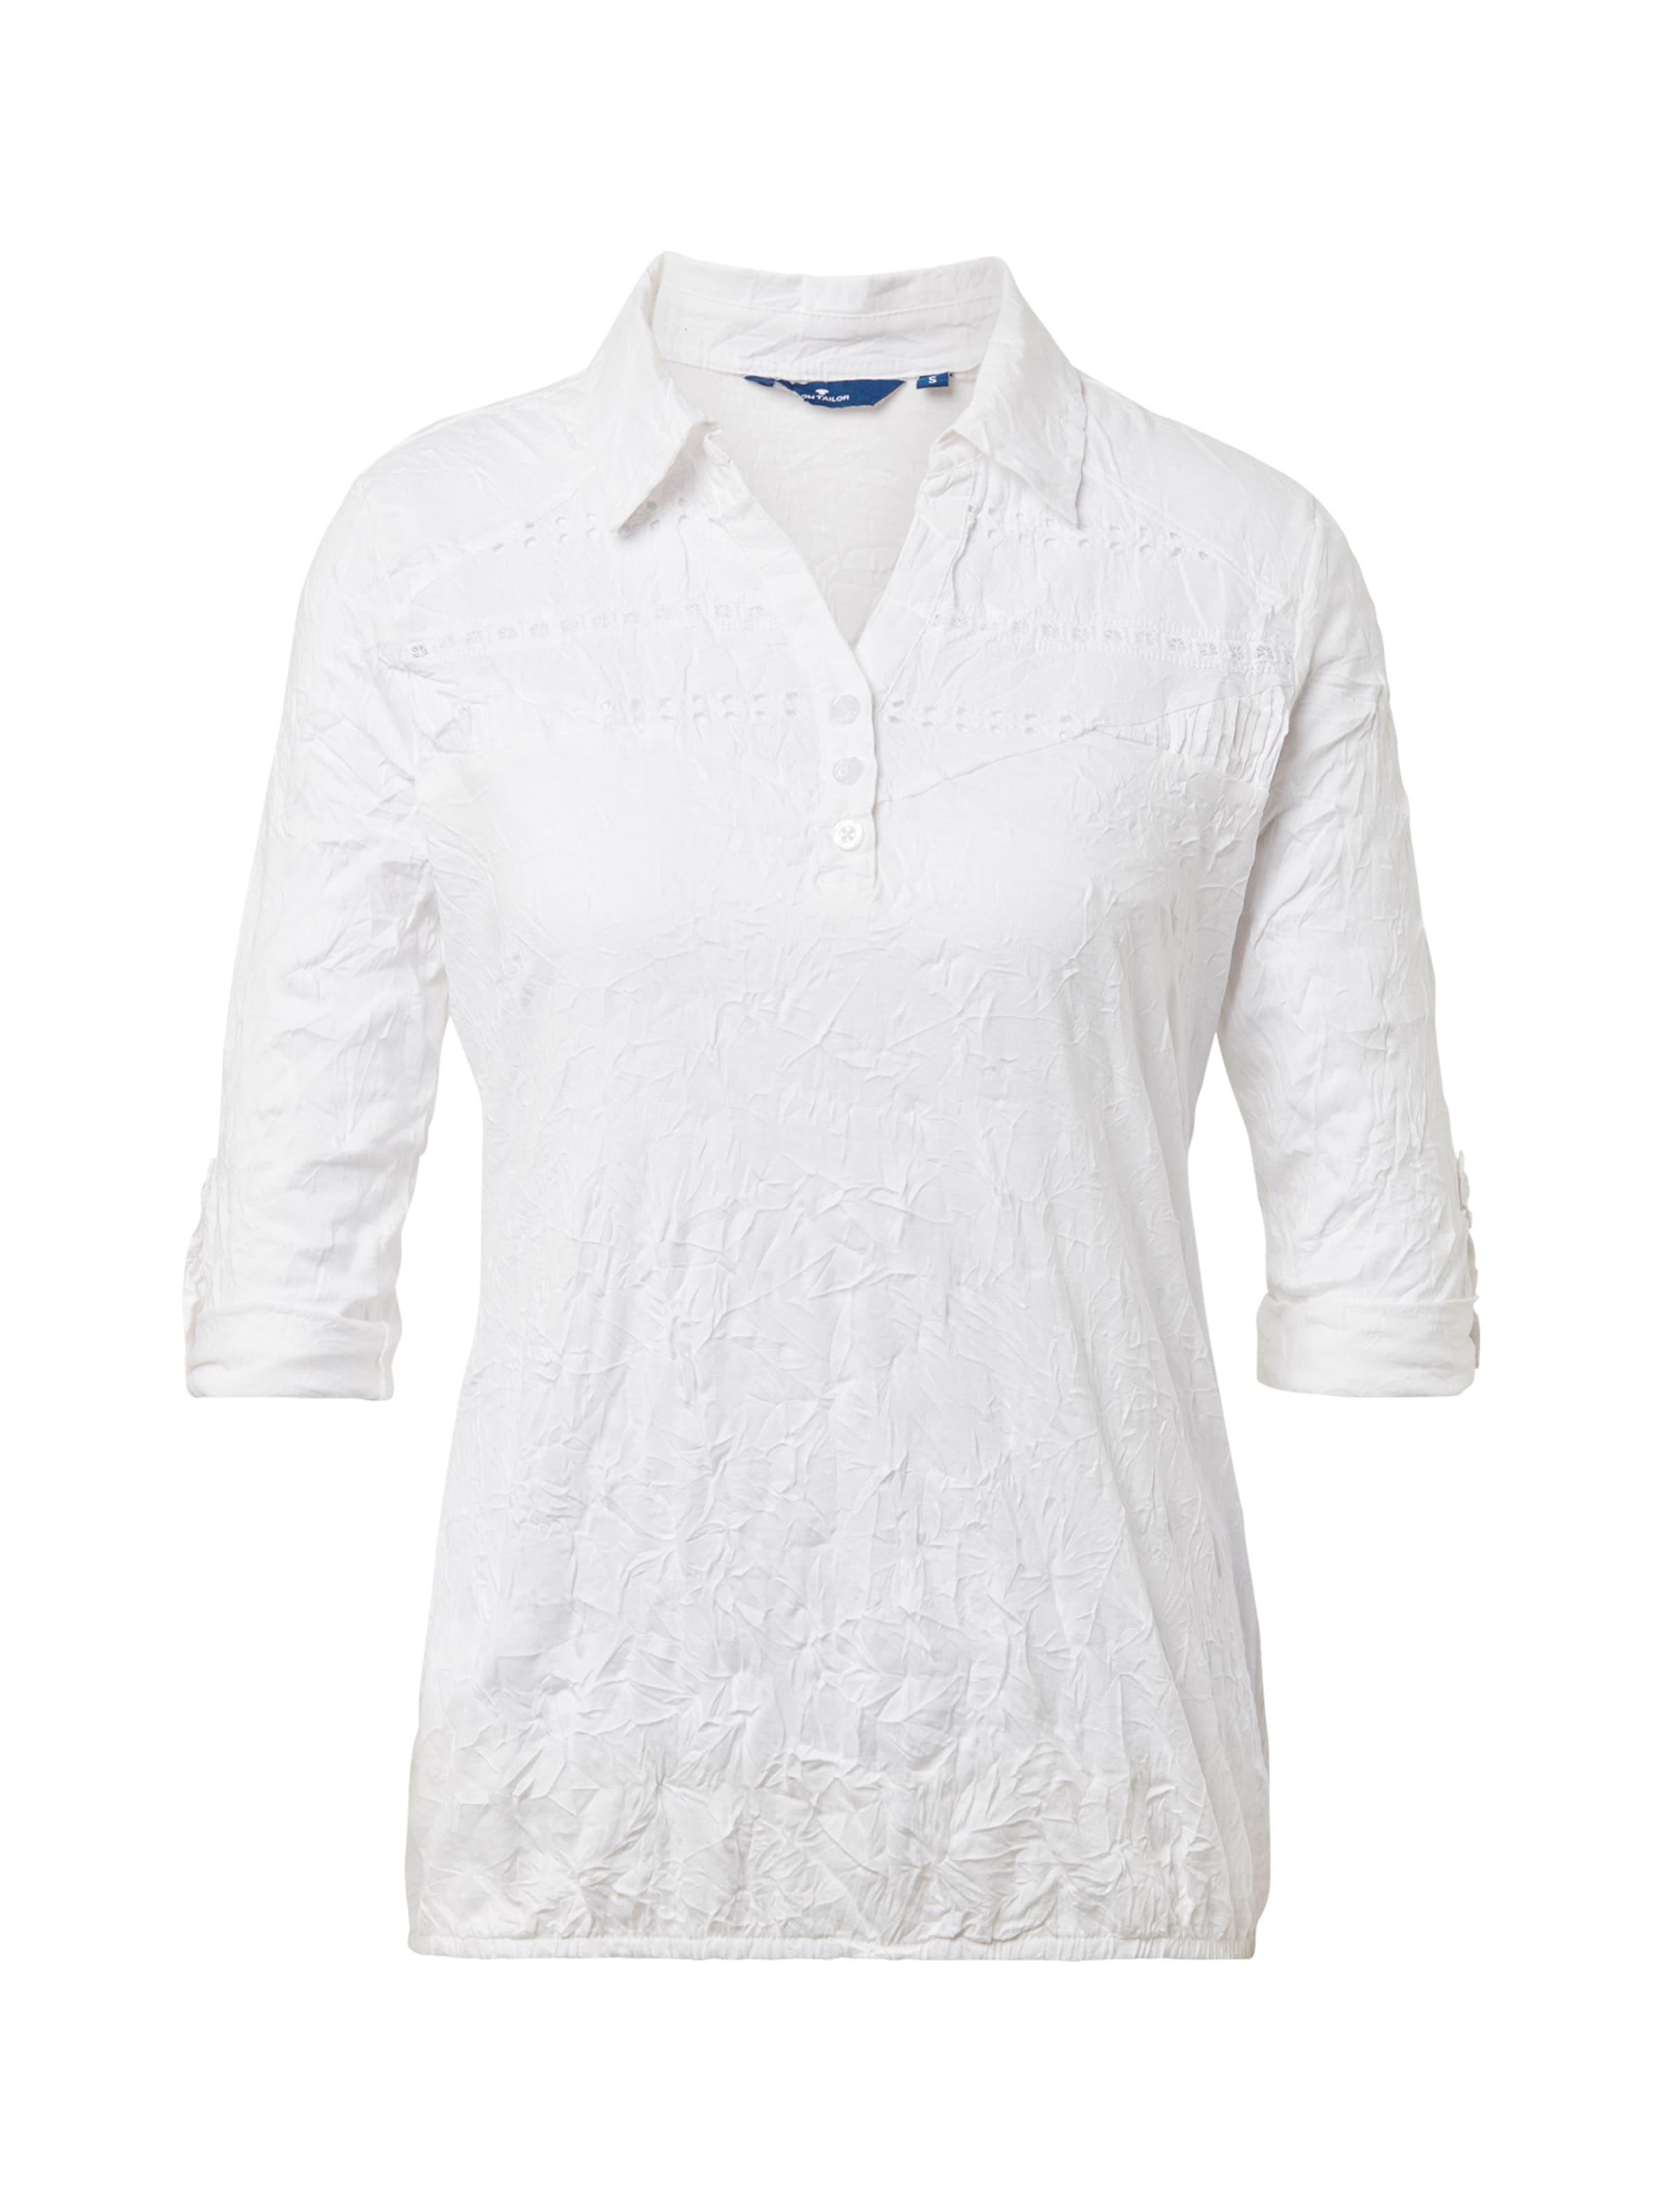 Poloshirts Poloshirts Tailor In Weiß Tom Tom Tailor CerxBWod